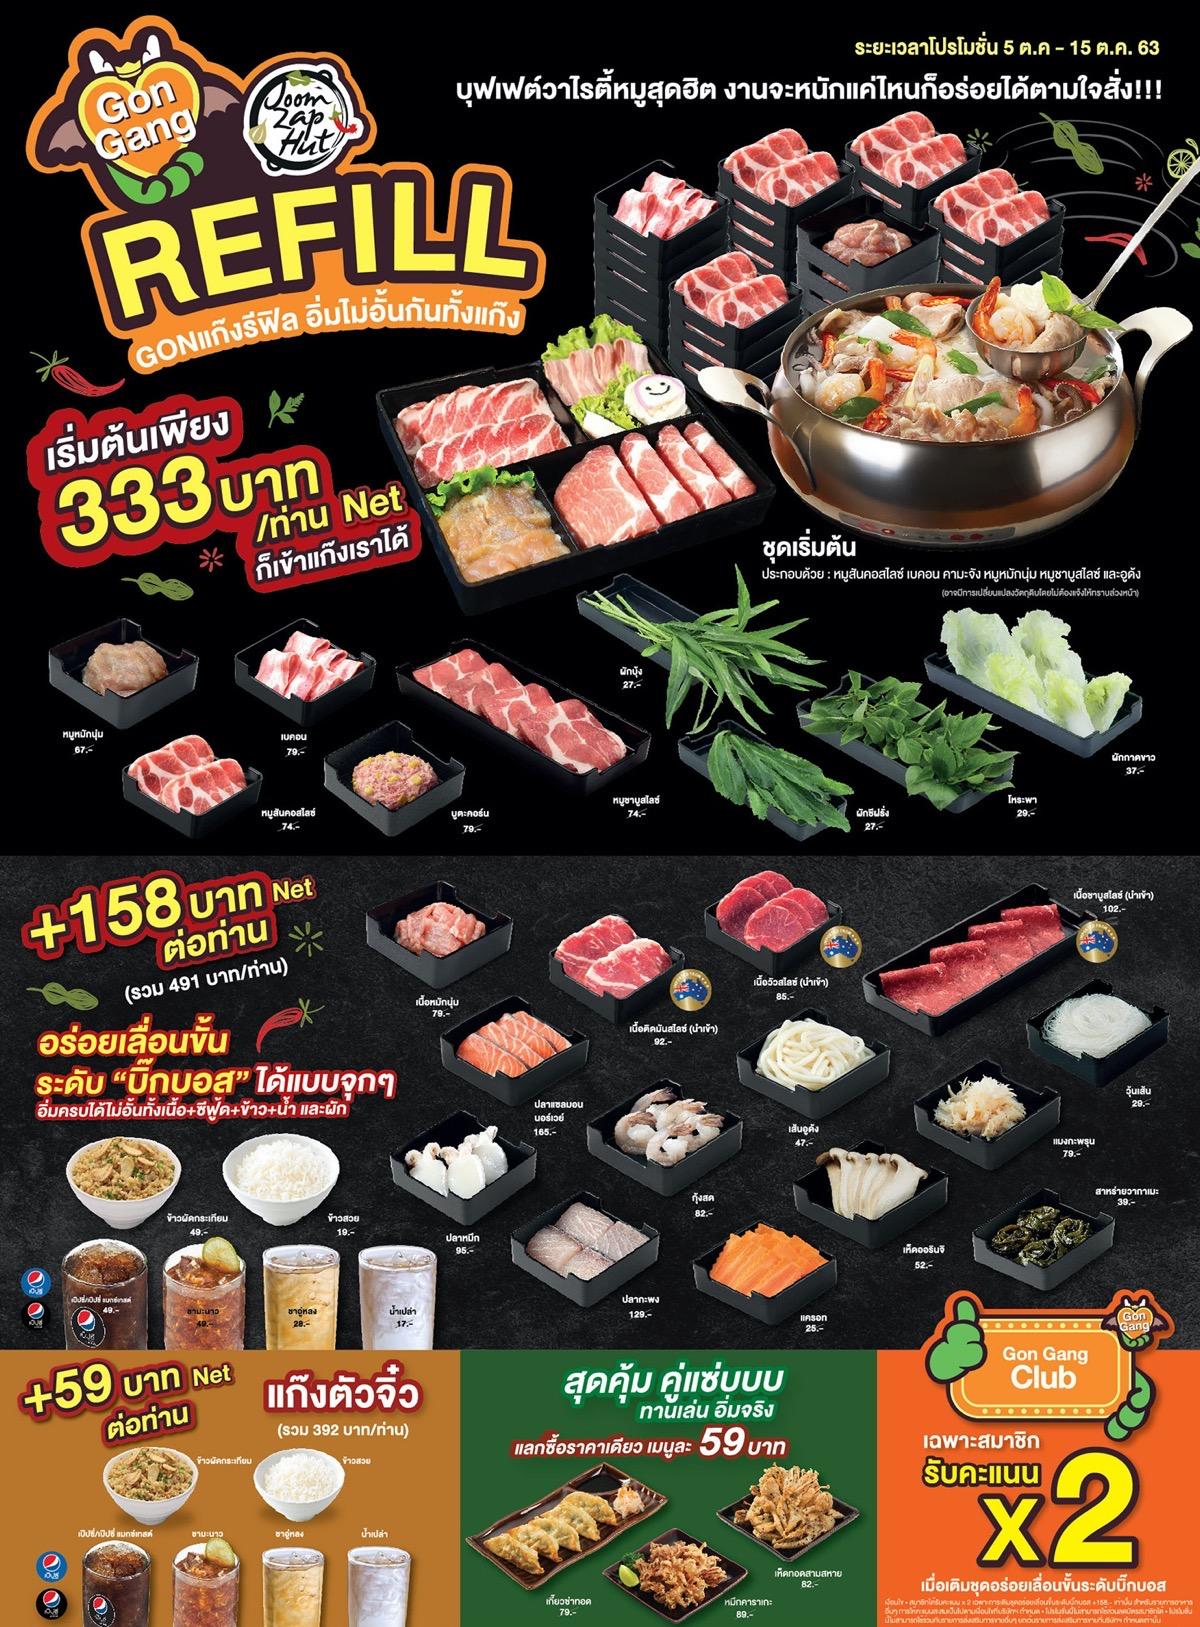 Promotion bbq plaza refill gon gang refill 2020 Joom Zaap Refill1